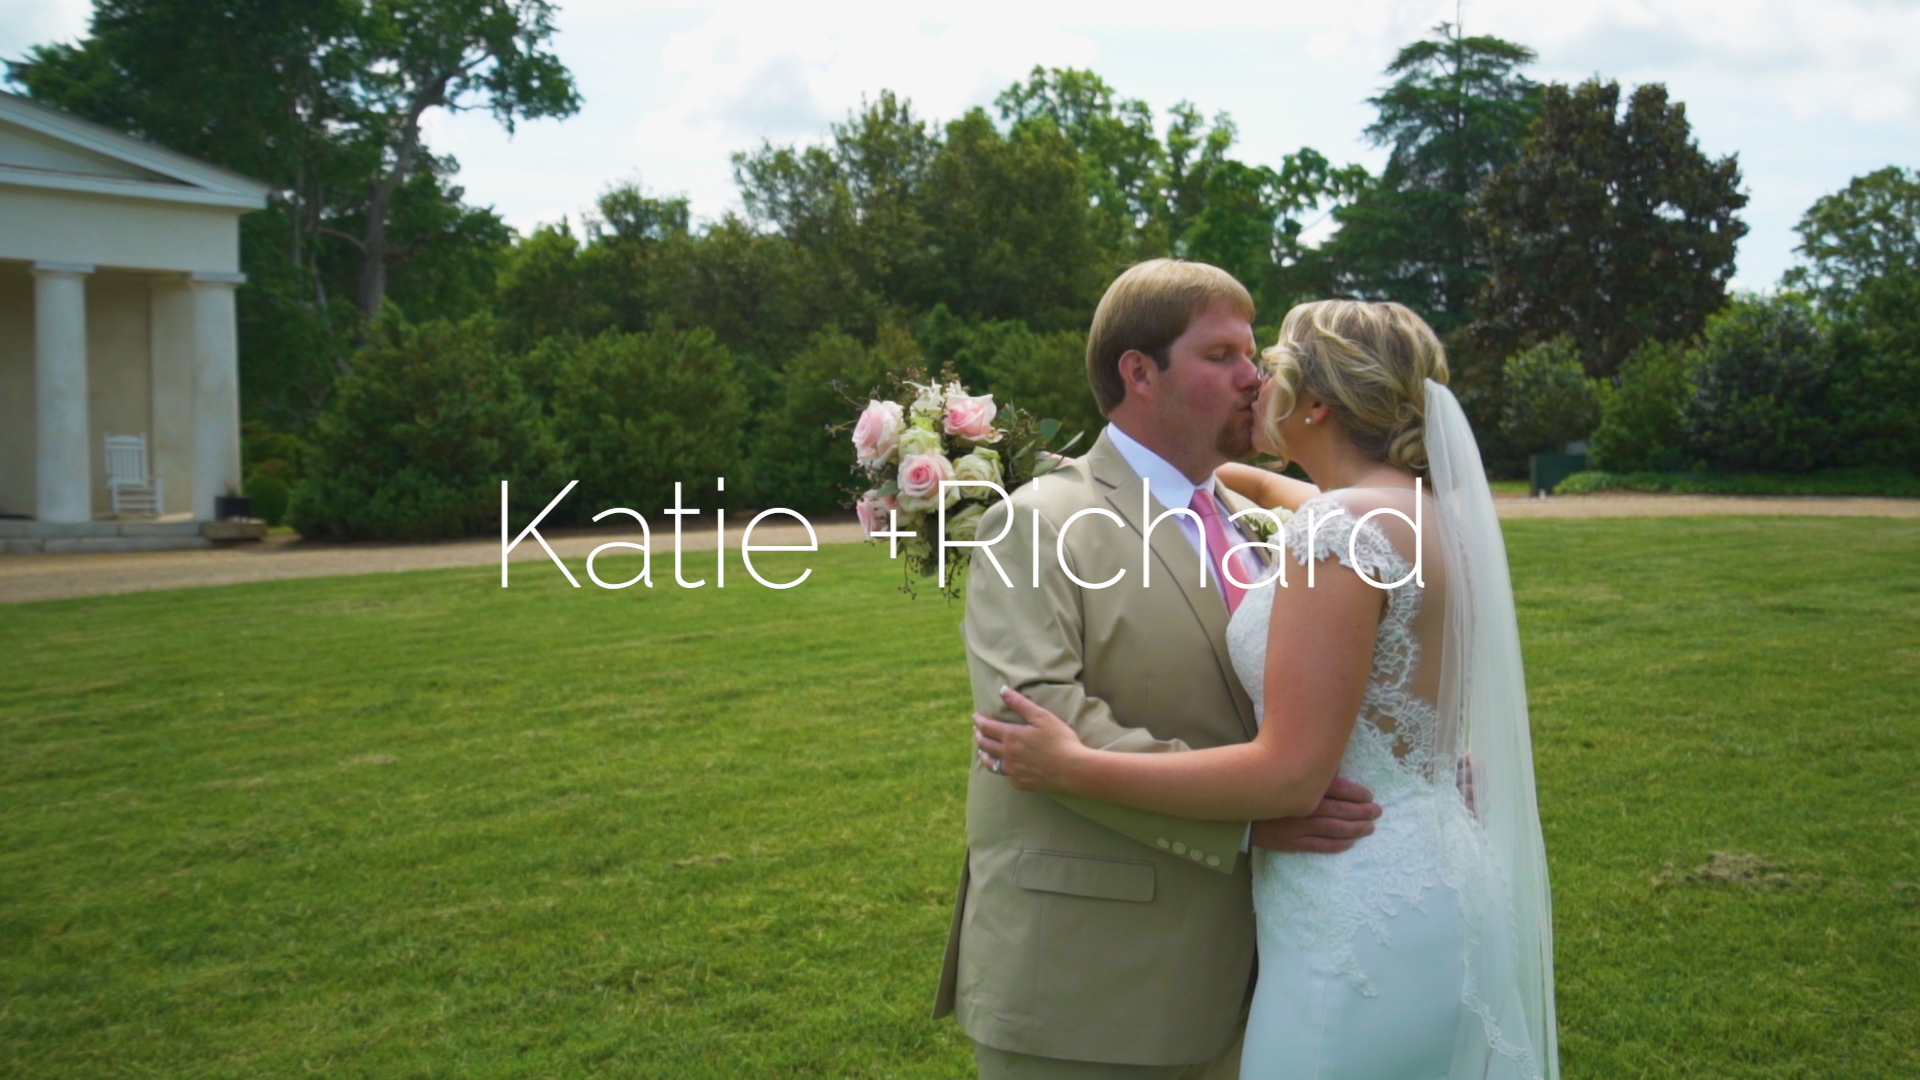 Katie + Richard | South Boston, Virginia | Berry Hill Mansion